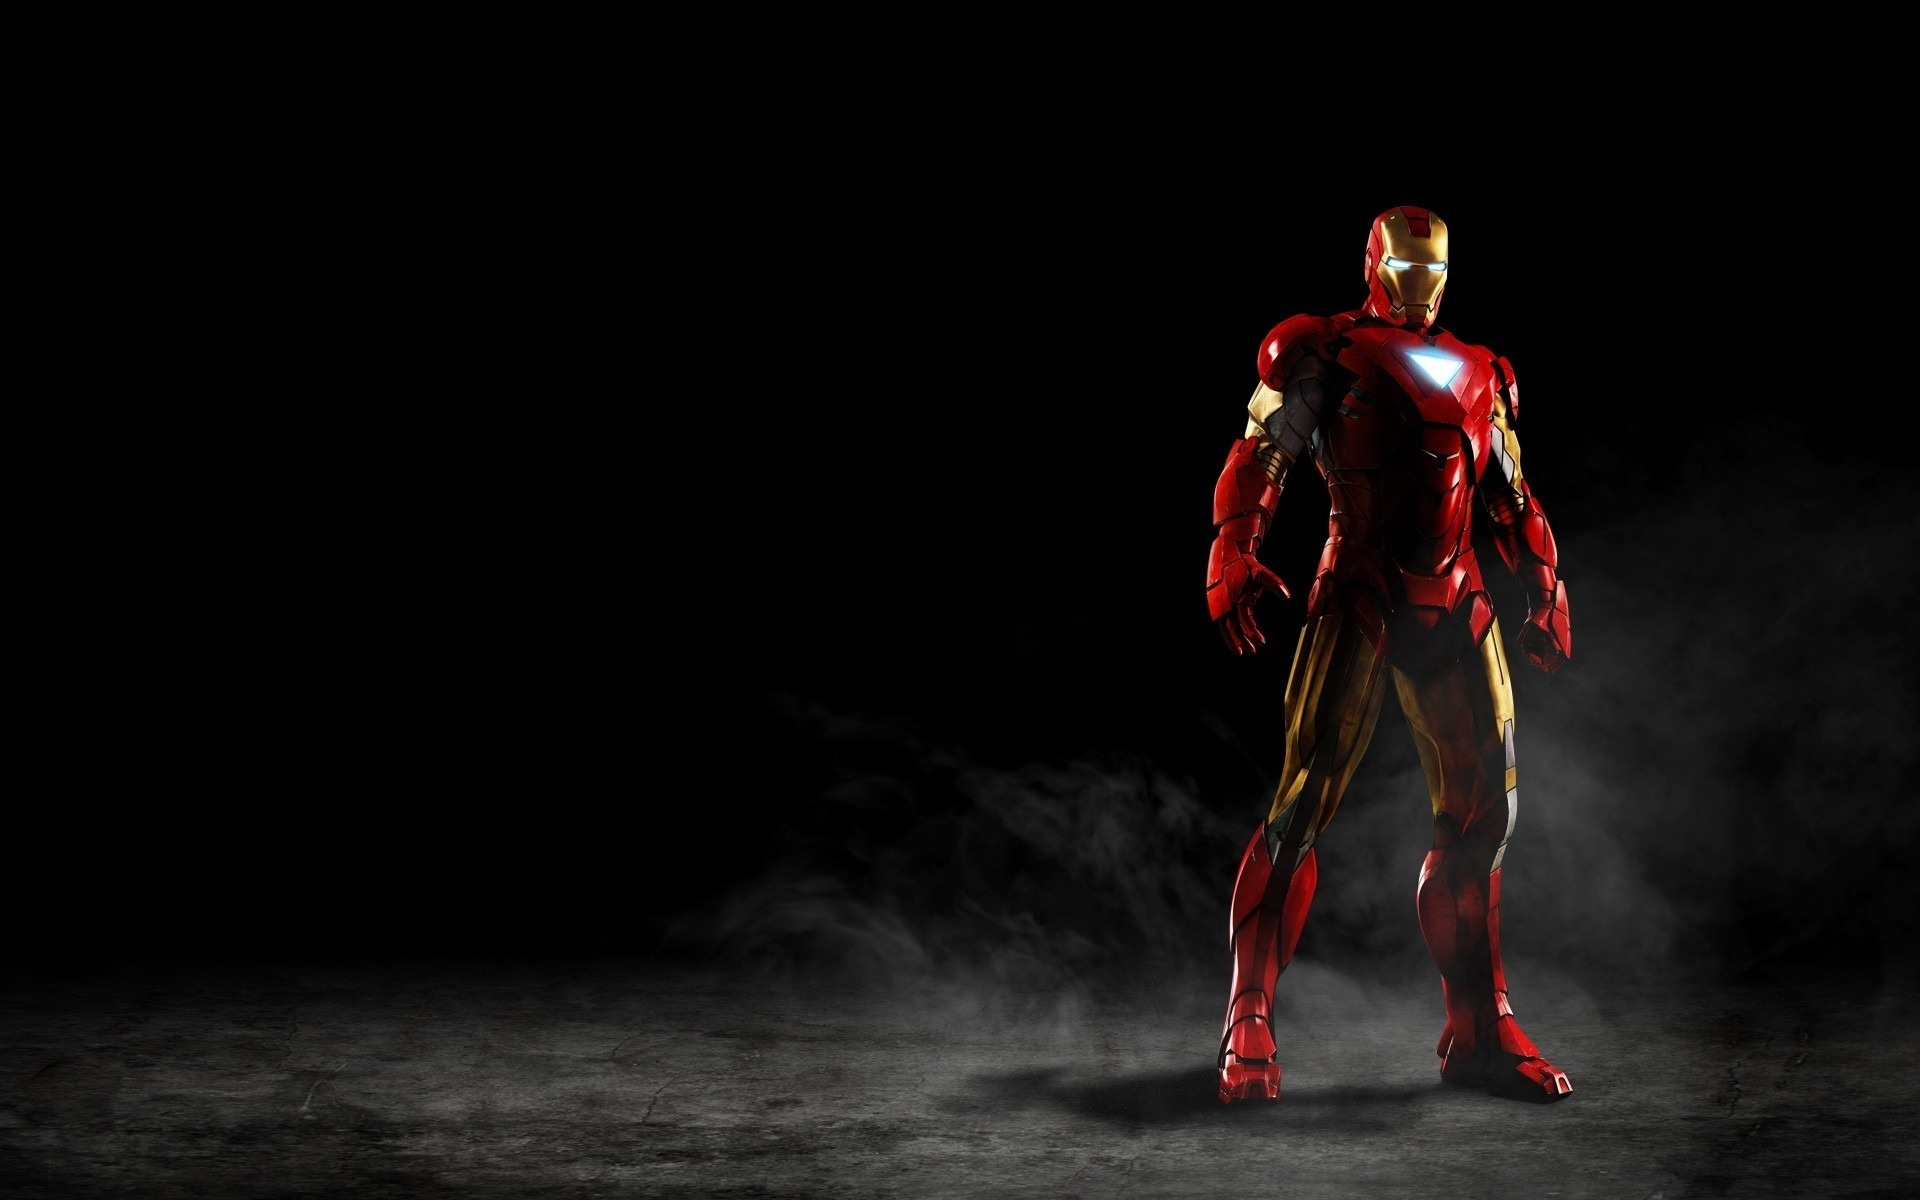 Iron Man   Iron Man 3 Wallpaper 31780175 1920x1200